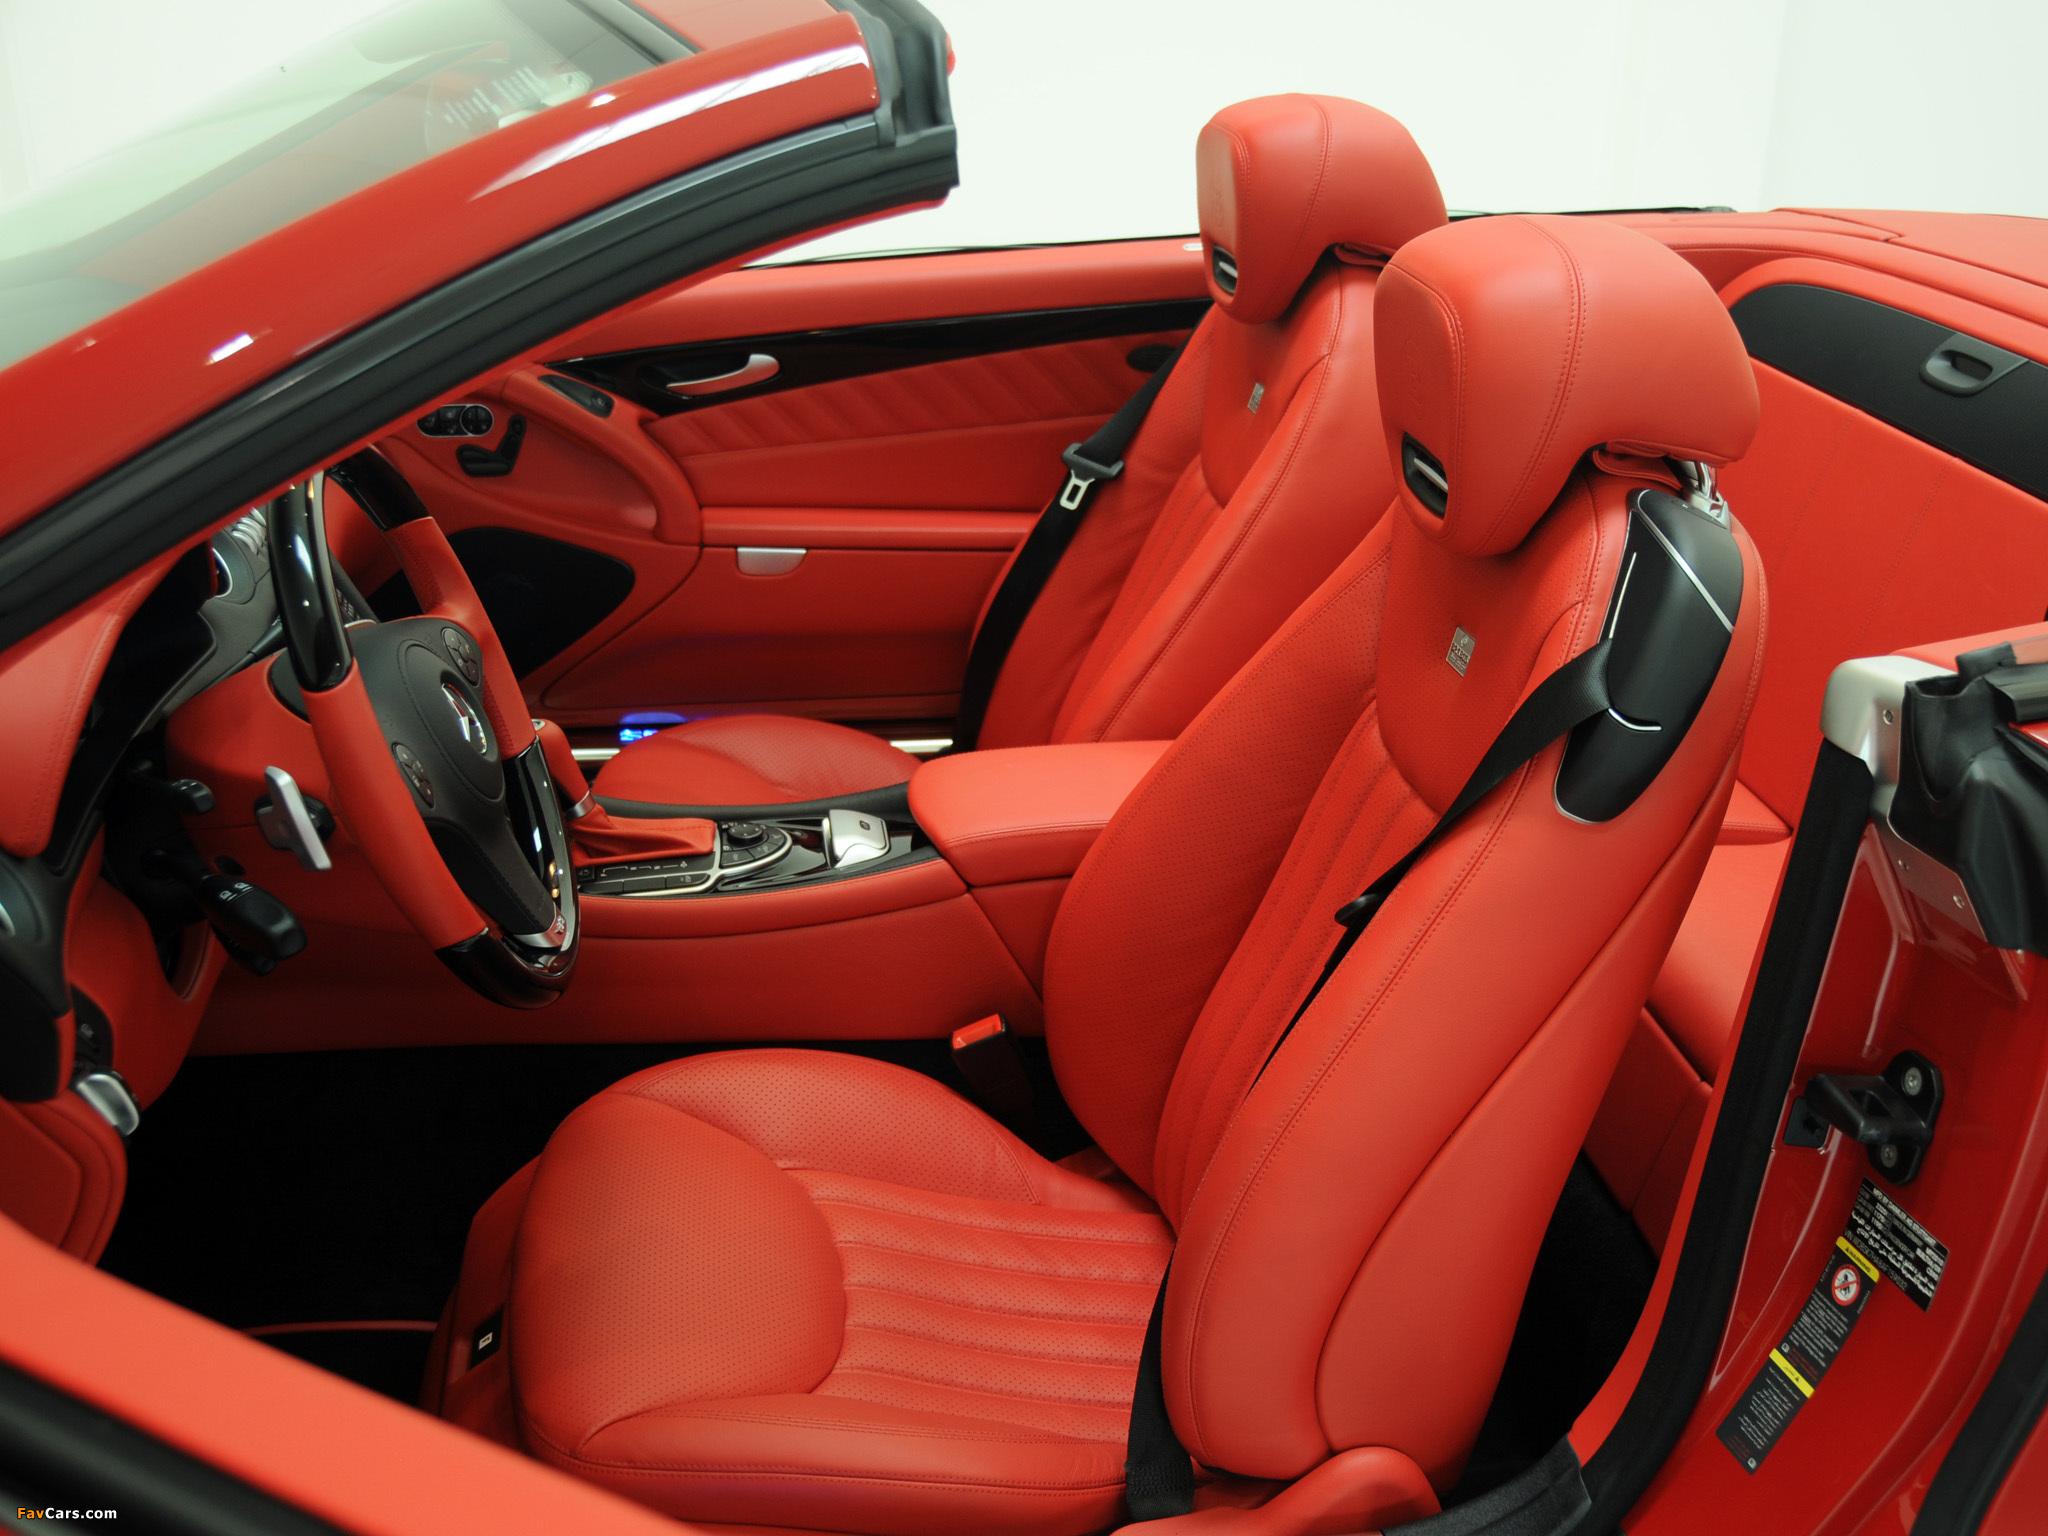 Brabus Mercedes-Benz SL-Klasse (R230) 2009–12 pictures (2048 x 1536)